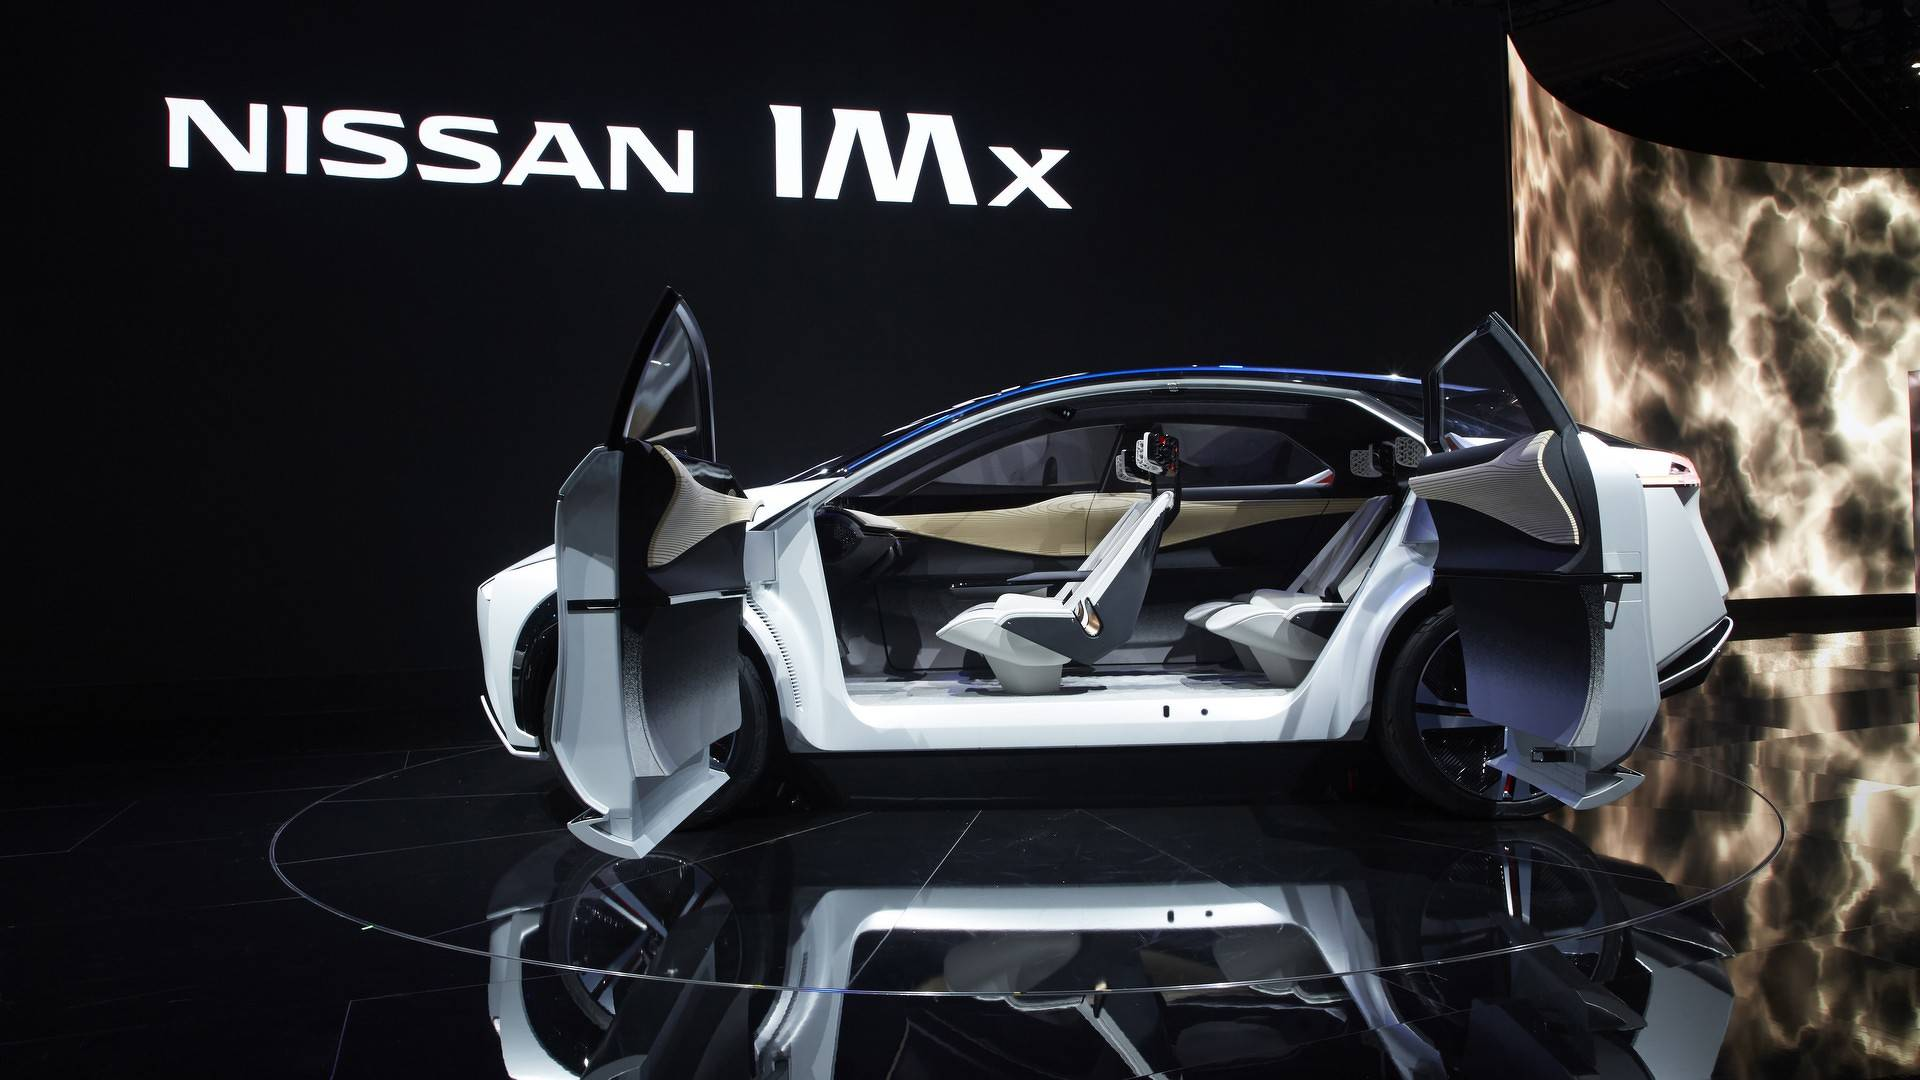 5a546d0eaf1d2 nissan imx concept نیسان IMX رونمایی شد   اجاره ماشین